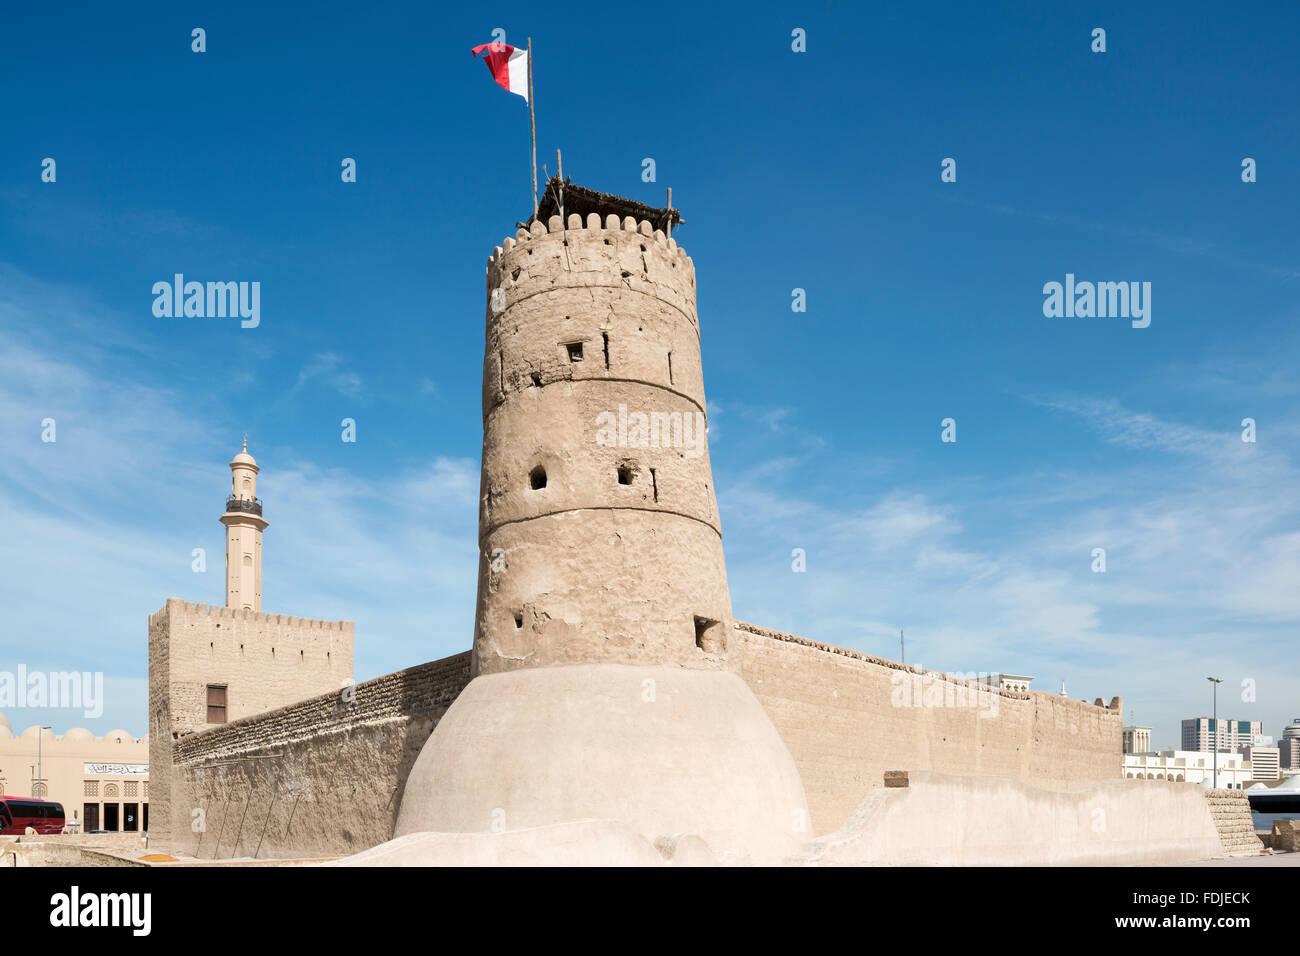 Al Fahidi Fort, Dubai Museum, Dubai, UAE - Stock Image